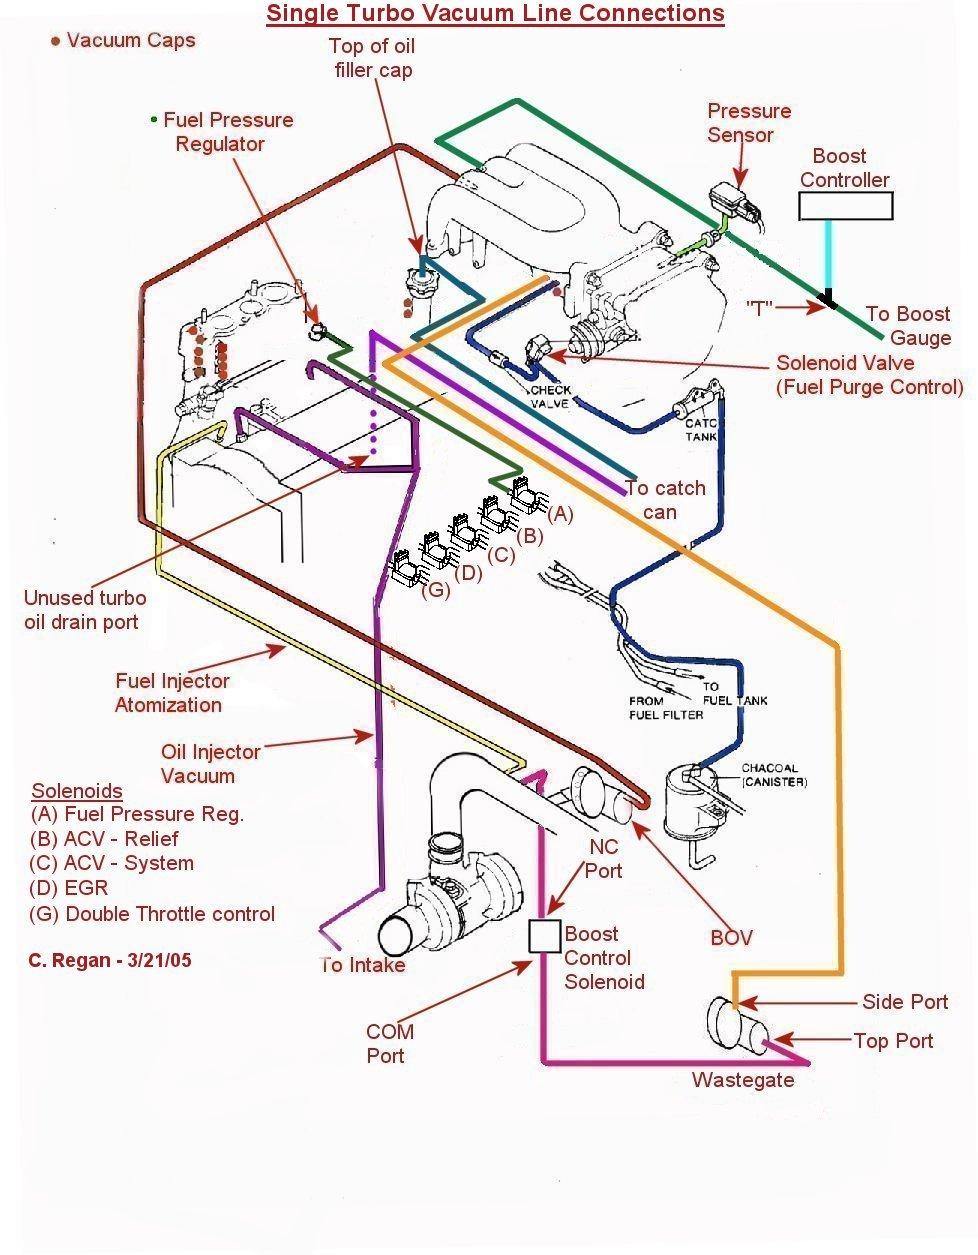 medium resolution of twin scroll vacuum line routing rx7club com mazda rx7 nissan 300zx twin turbo vacuum diagram subaru